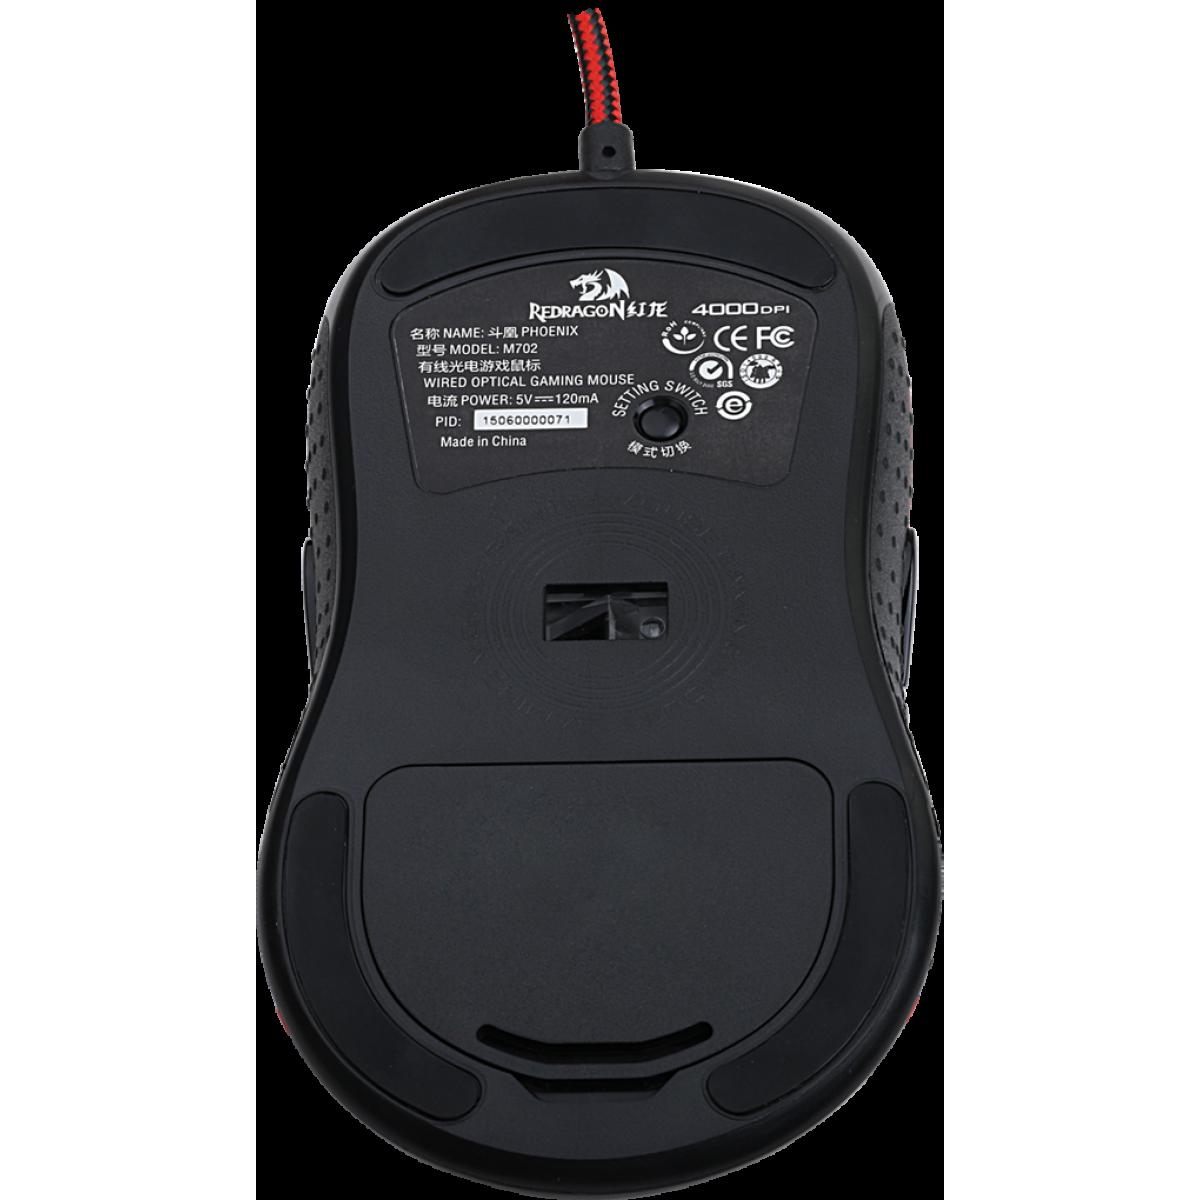 Mouse Gamer Redragon Phoenix M702, 4000 DPI, 9 Botões, Black